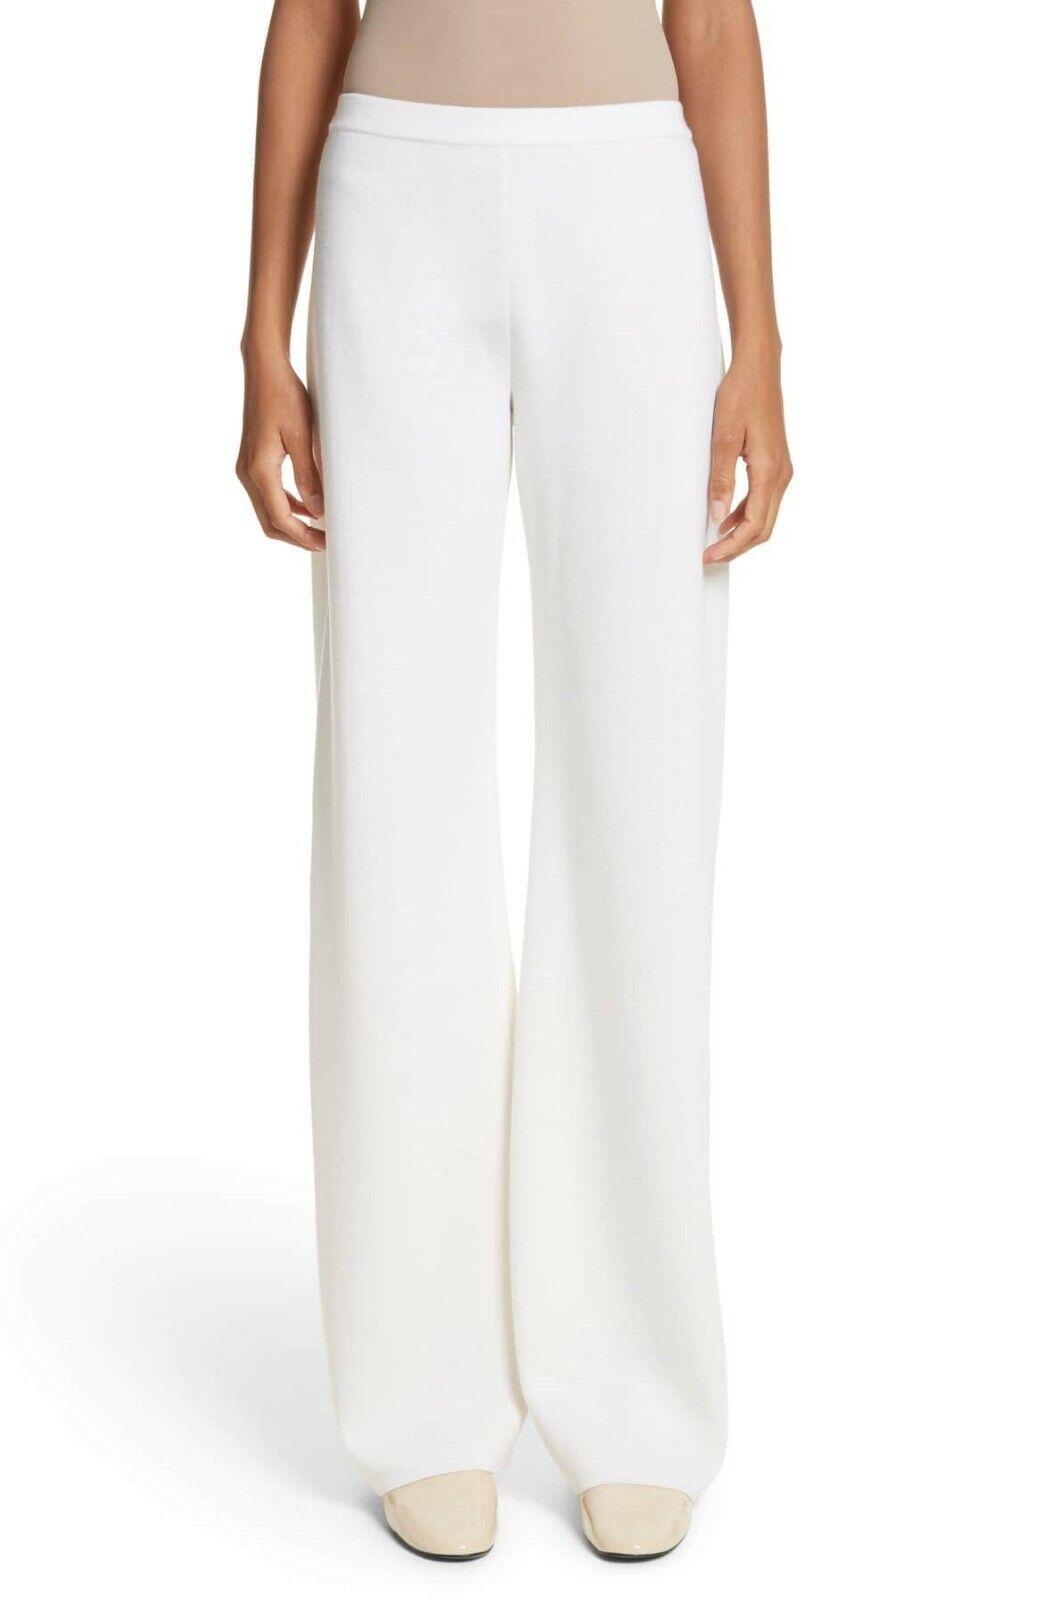 MAX MARA Cream White Pure Wool Knit BRANDO Relaxed Fit Wide Leg Pants L 10 12